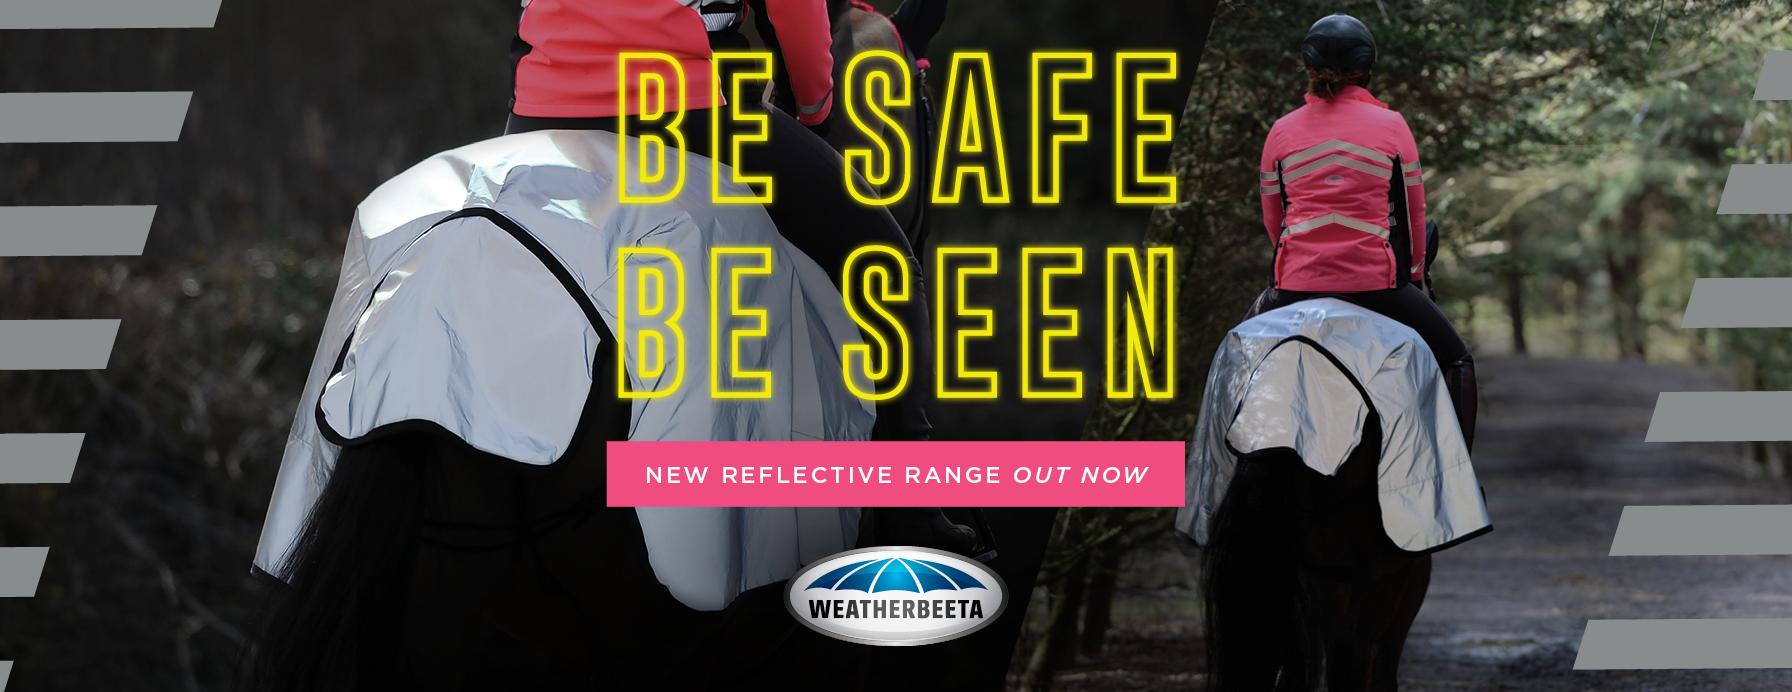 weatherbeeta reflective hi-viz range